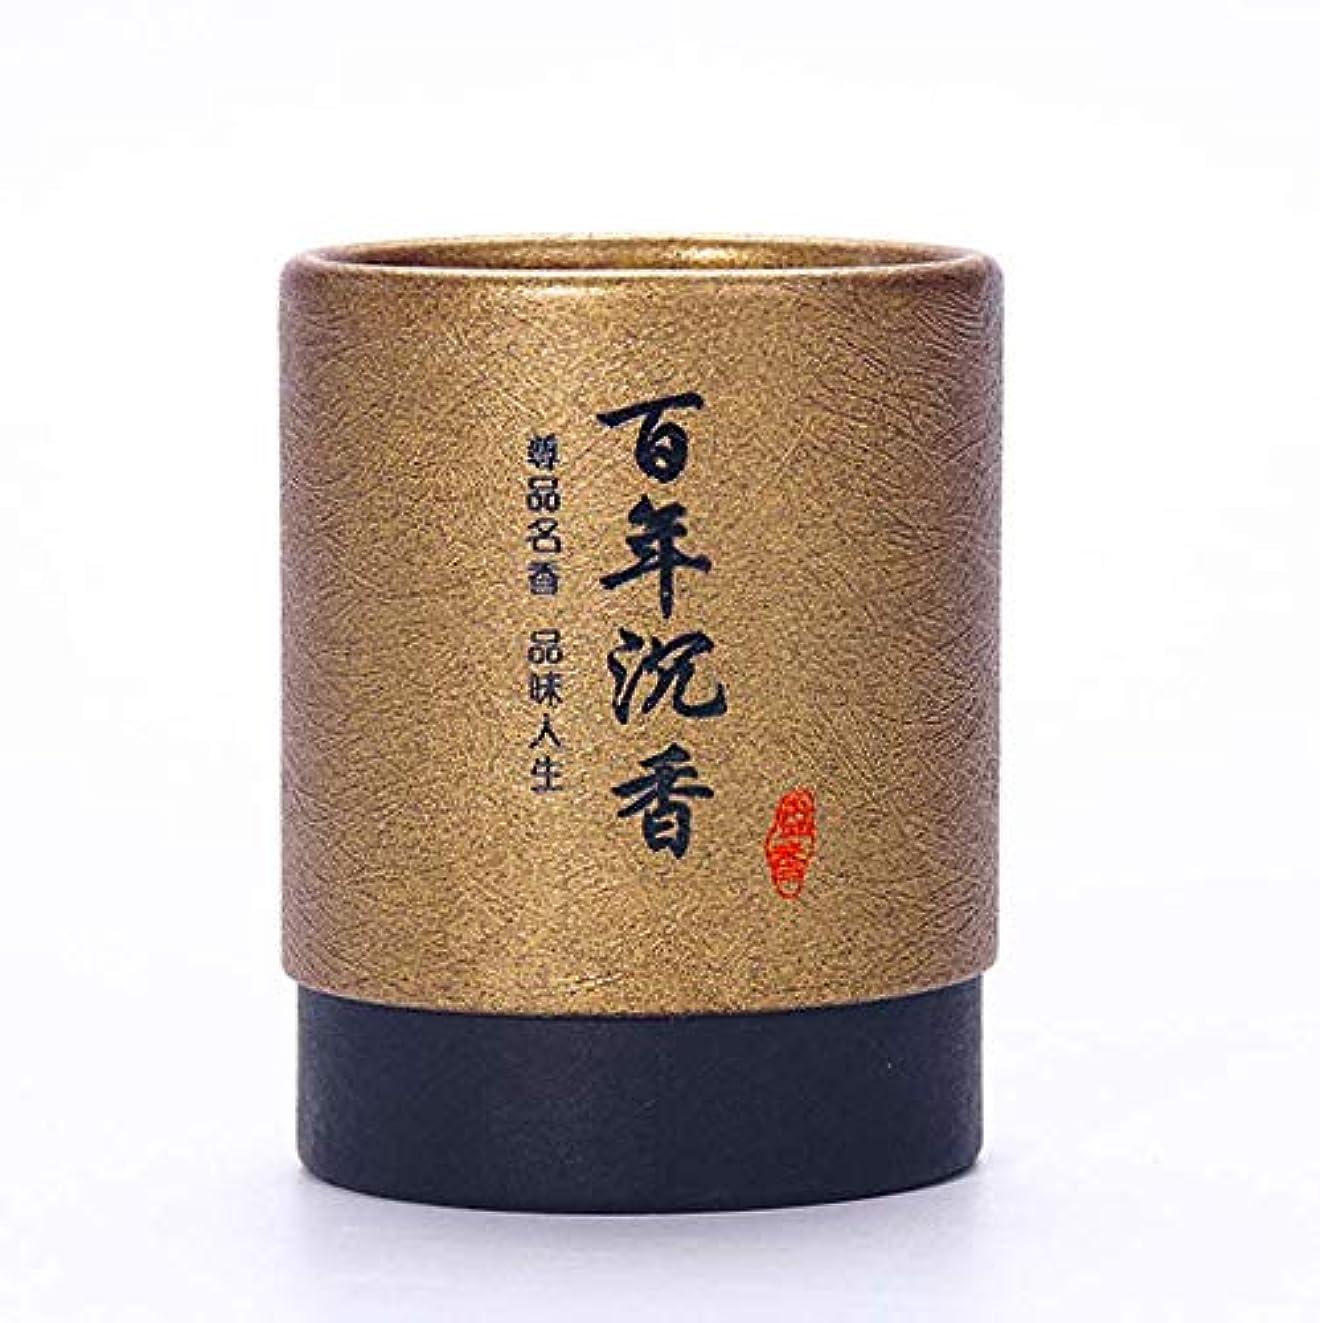 HwaGui お香 2時間 盤香 渦巻き線香 優しい香り 48巻入 沉香(百年沈香)